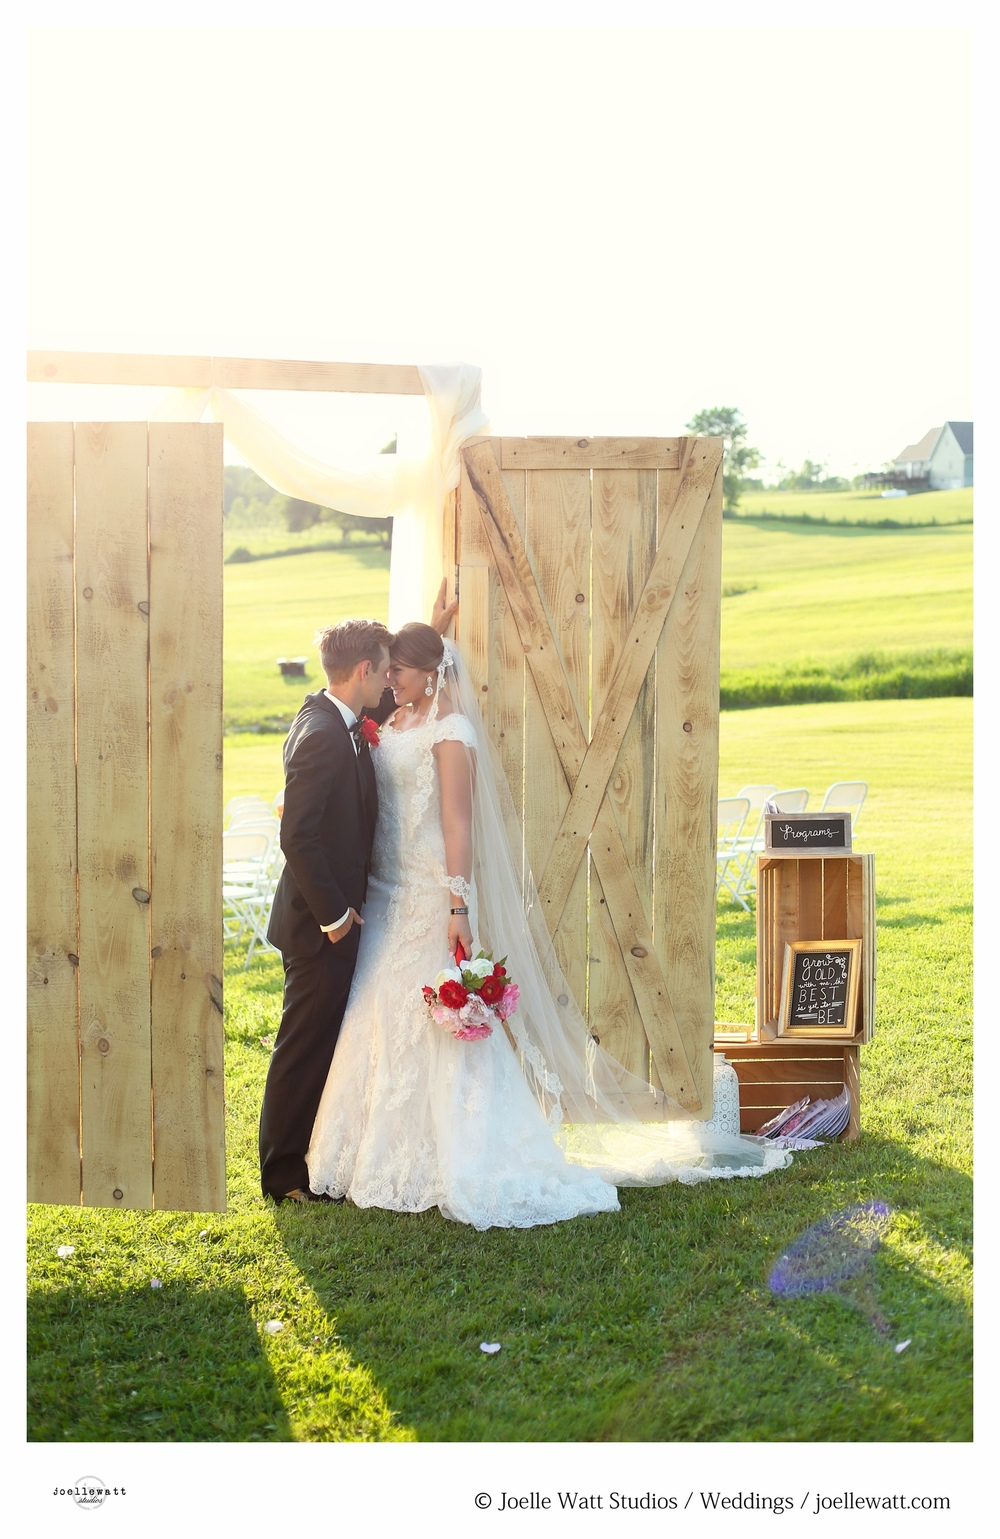 Terwiske Wedding 15.jpg